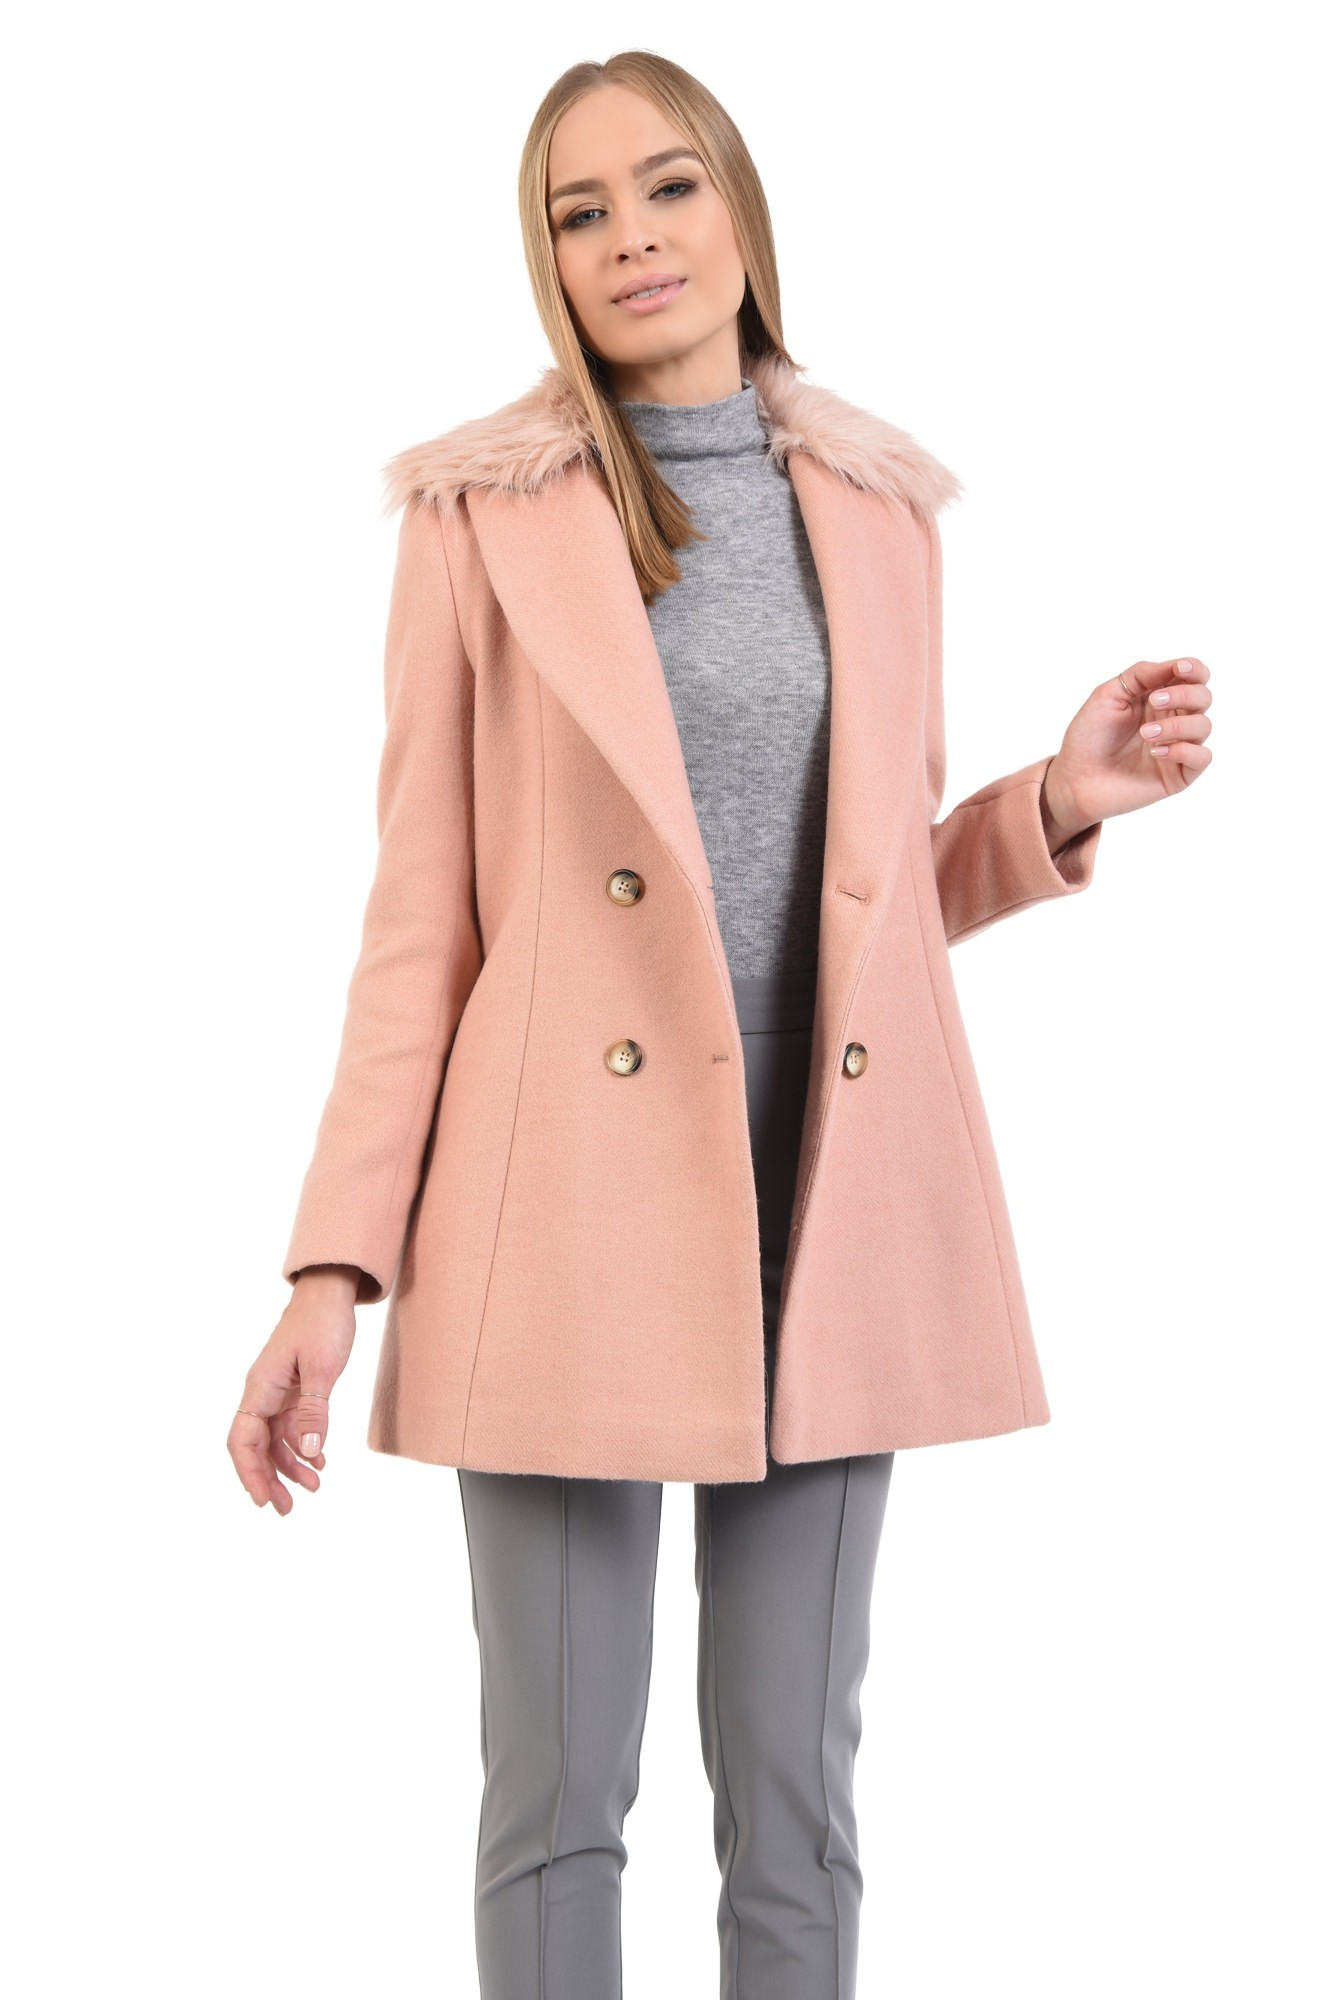 0 - palton din lana, roz, doua randuri de nasturi, guler asortat